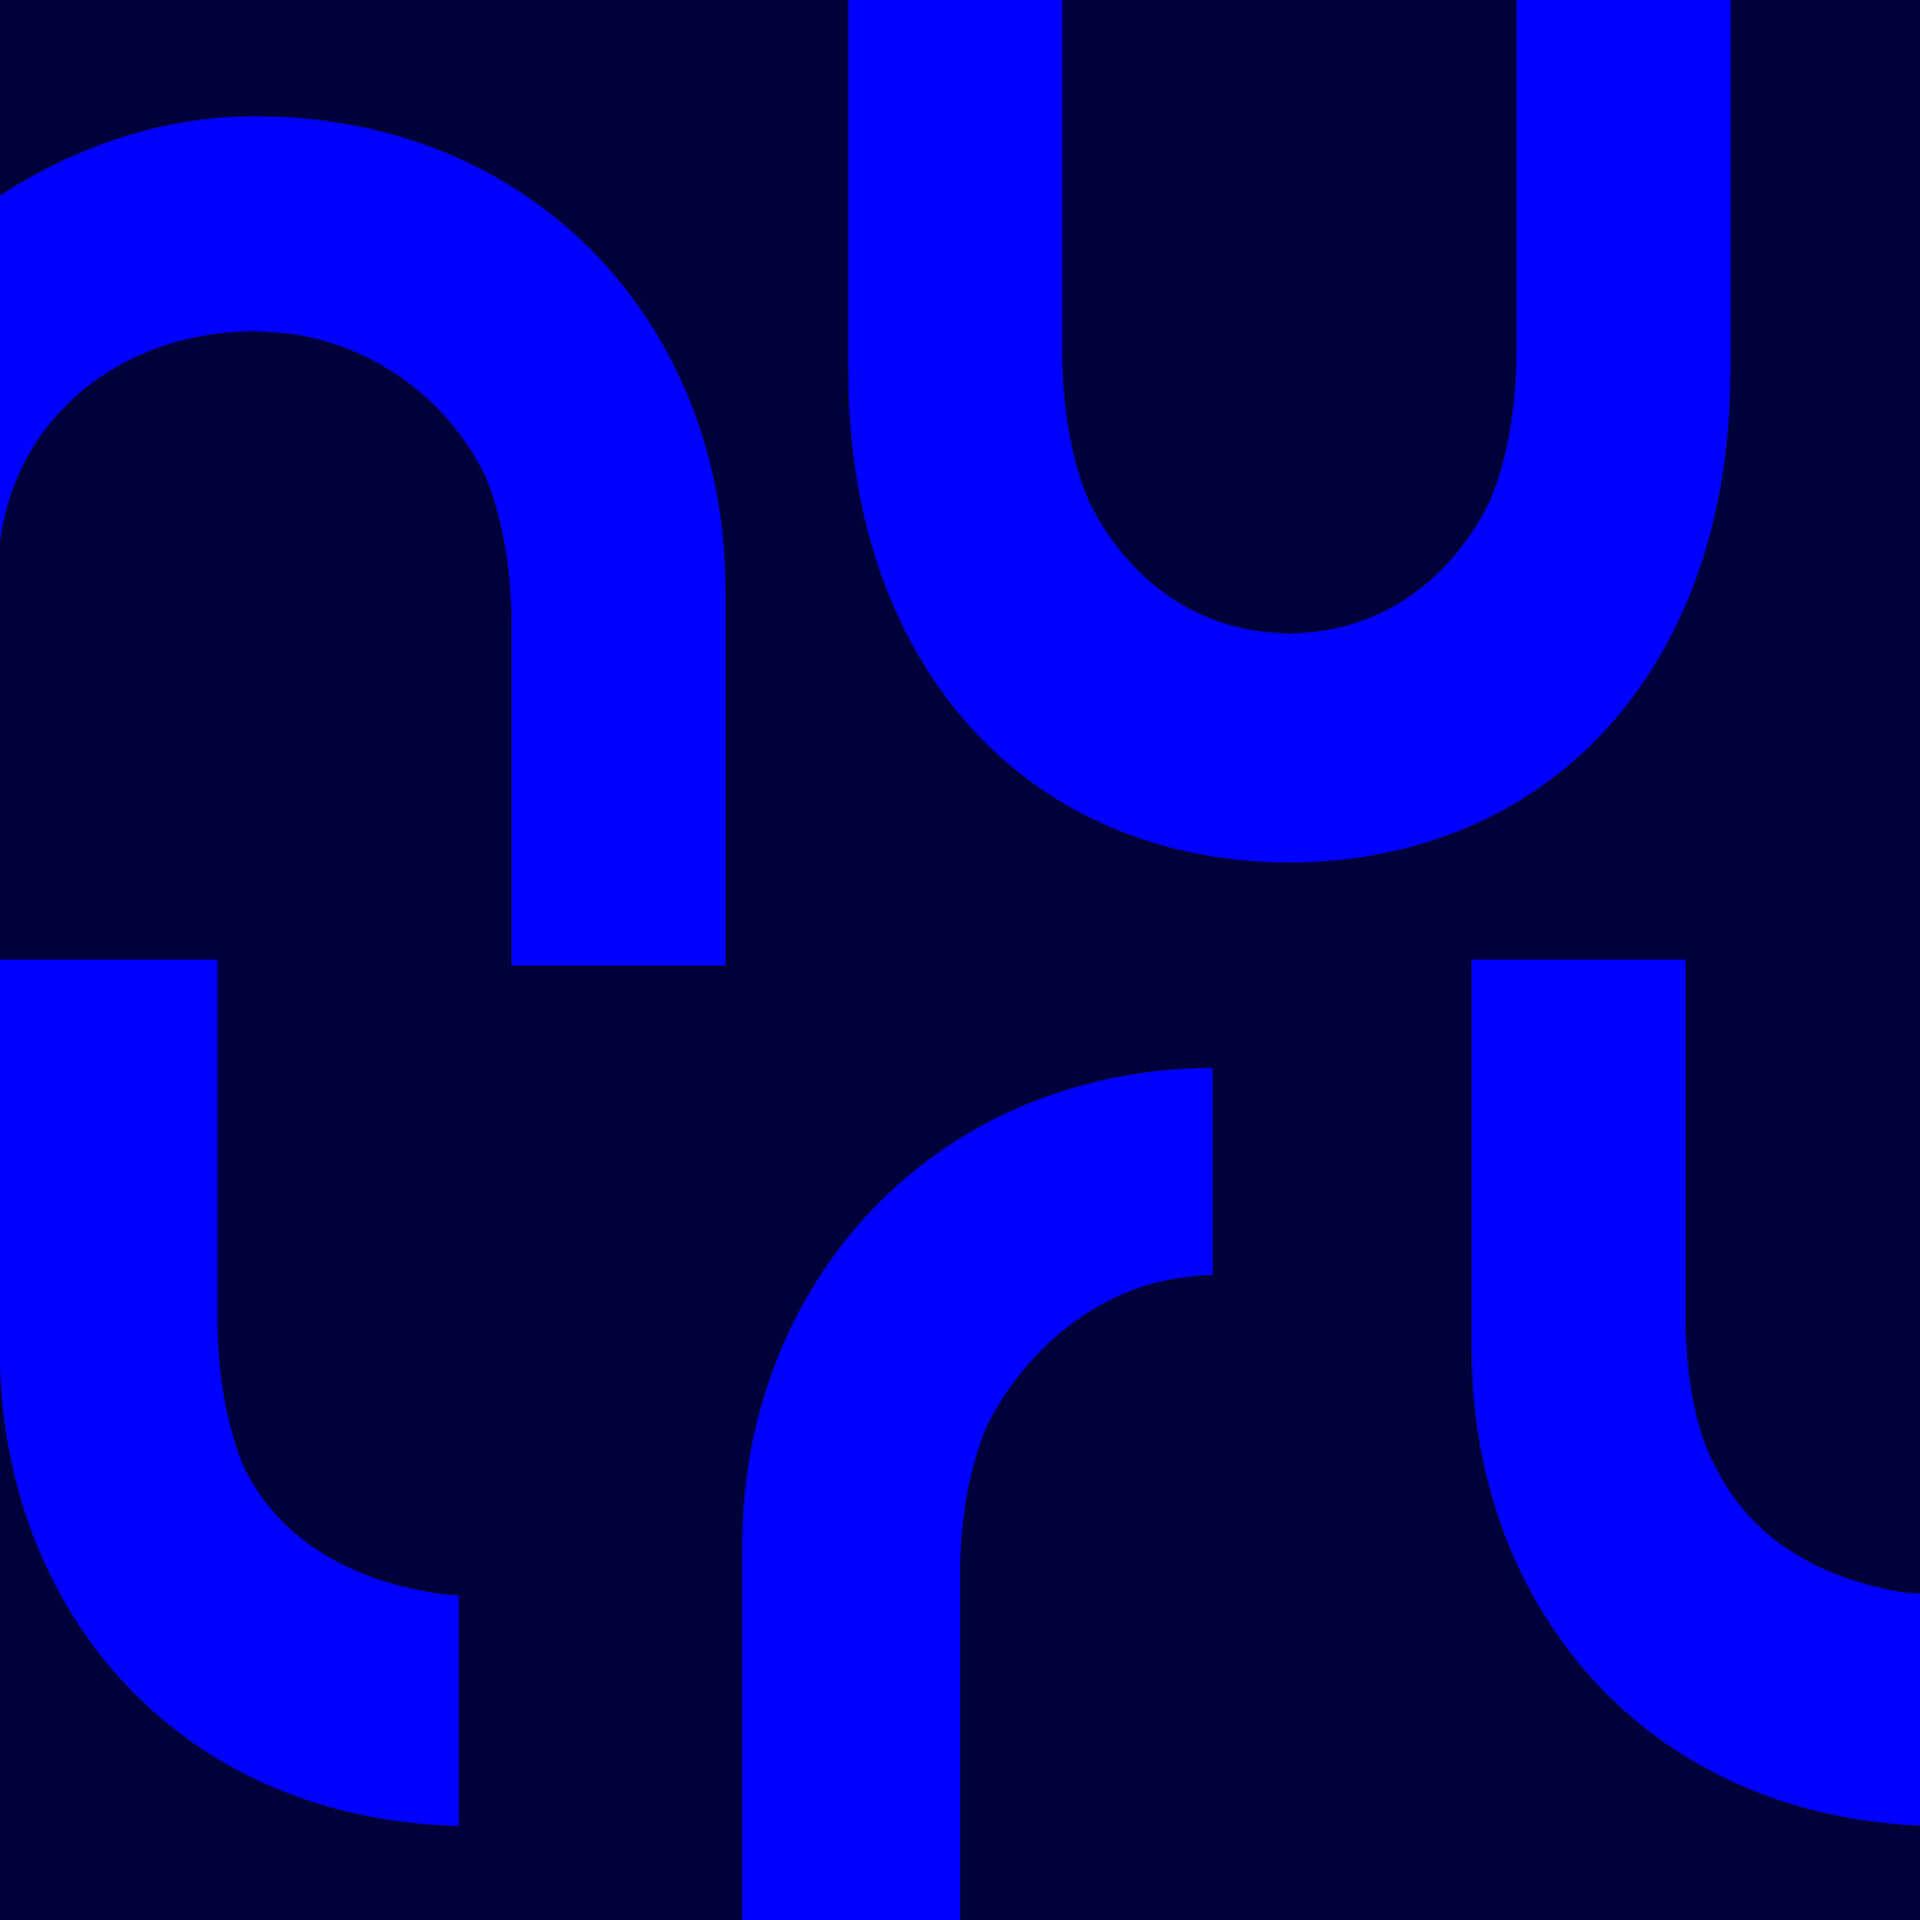 AOKI takamasaとFumitake Tamuraによるユニット・Neutralの音源集がBandcampにて発売中!AOKI takamasaは渋谷VISIONでの<TECHNO INVADERS>にも参加 music201002_neutral-sounds_4-1920x1920